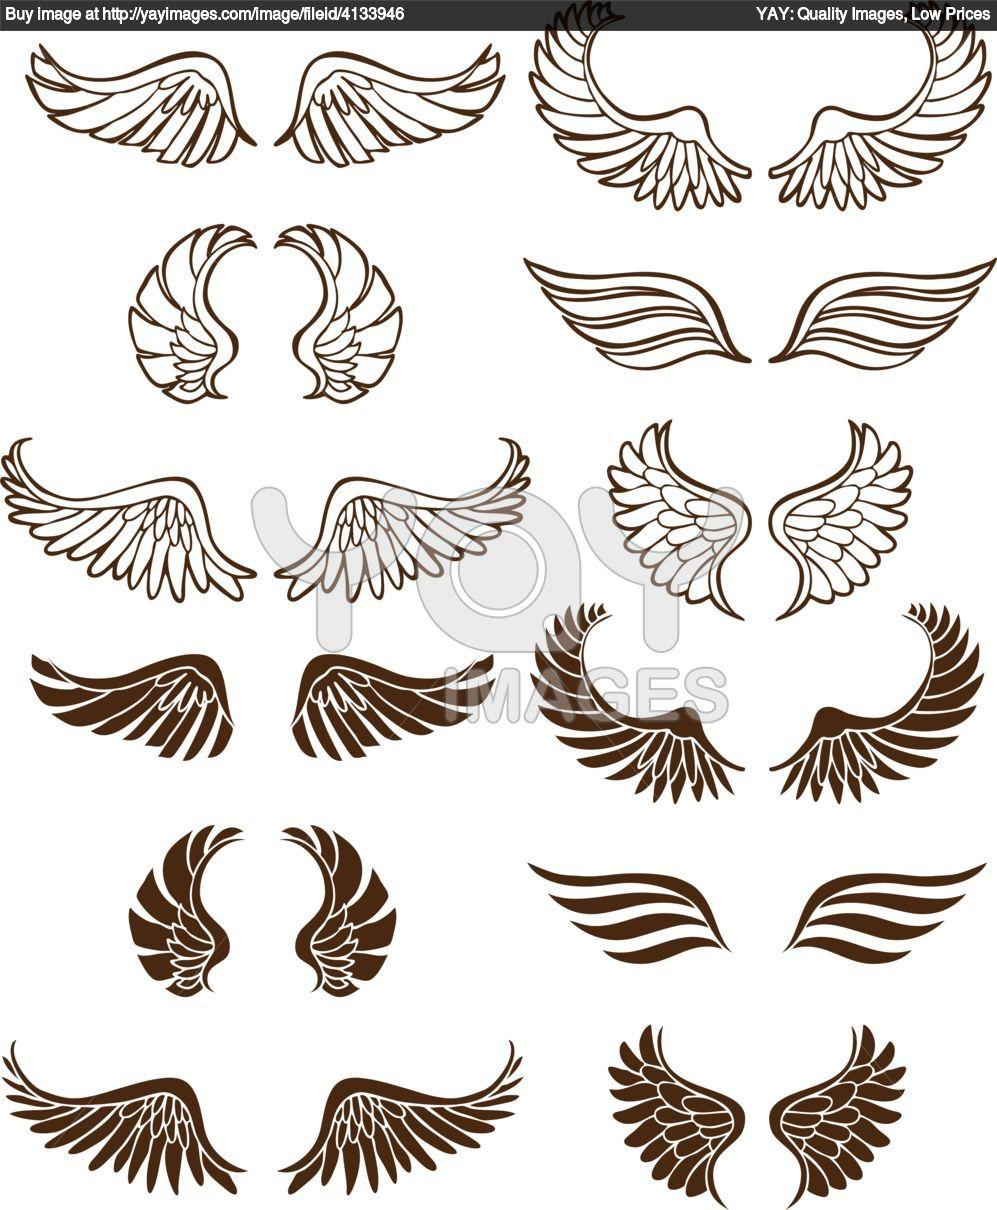 royalty free vector of angel wings wings pinterest. Black Bedroom Furniture Sets. Home Design Ideas